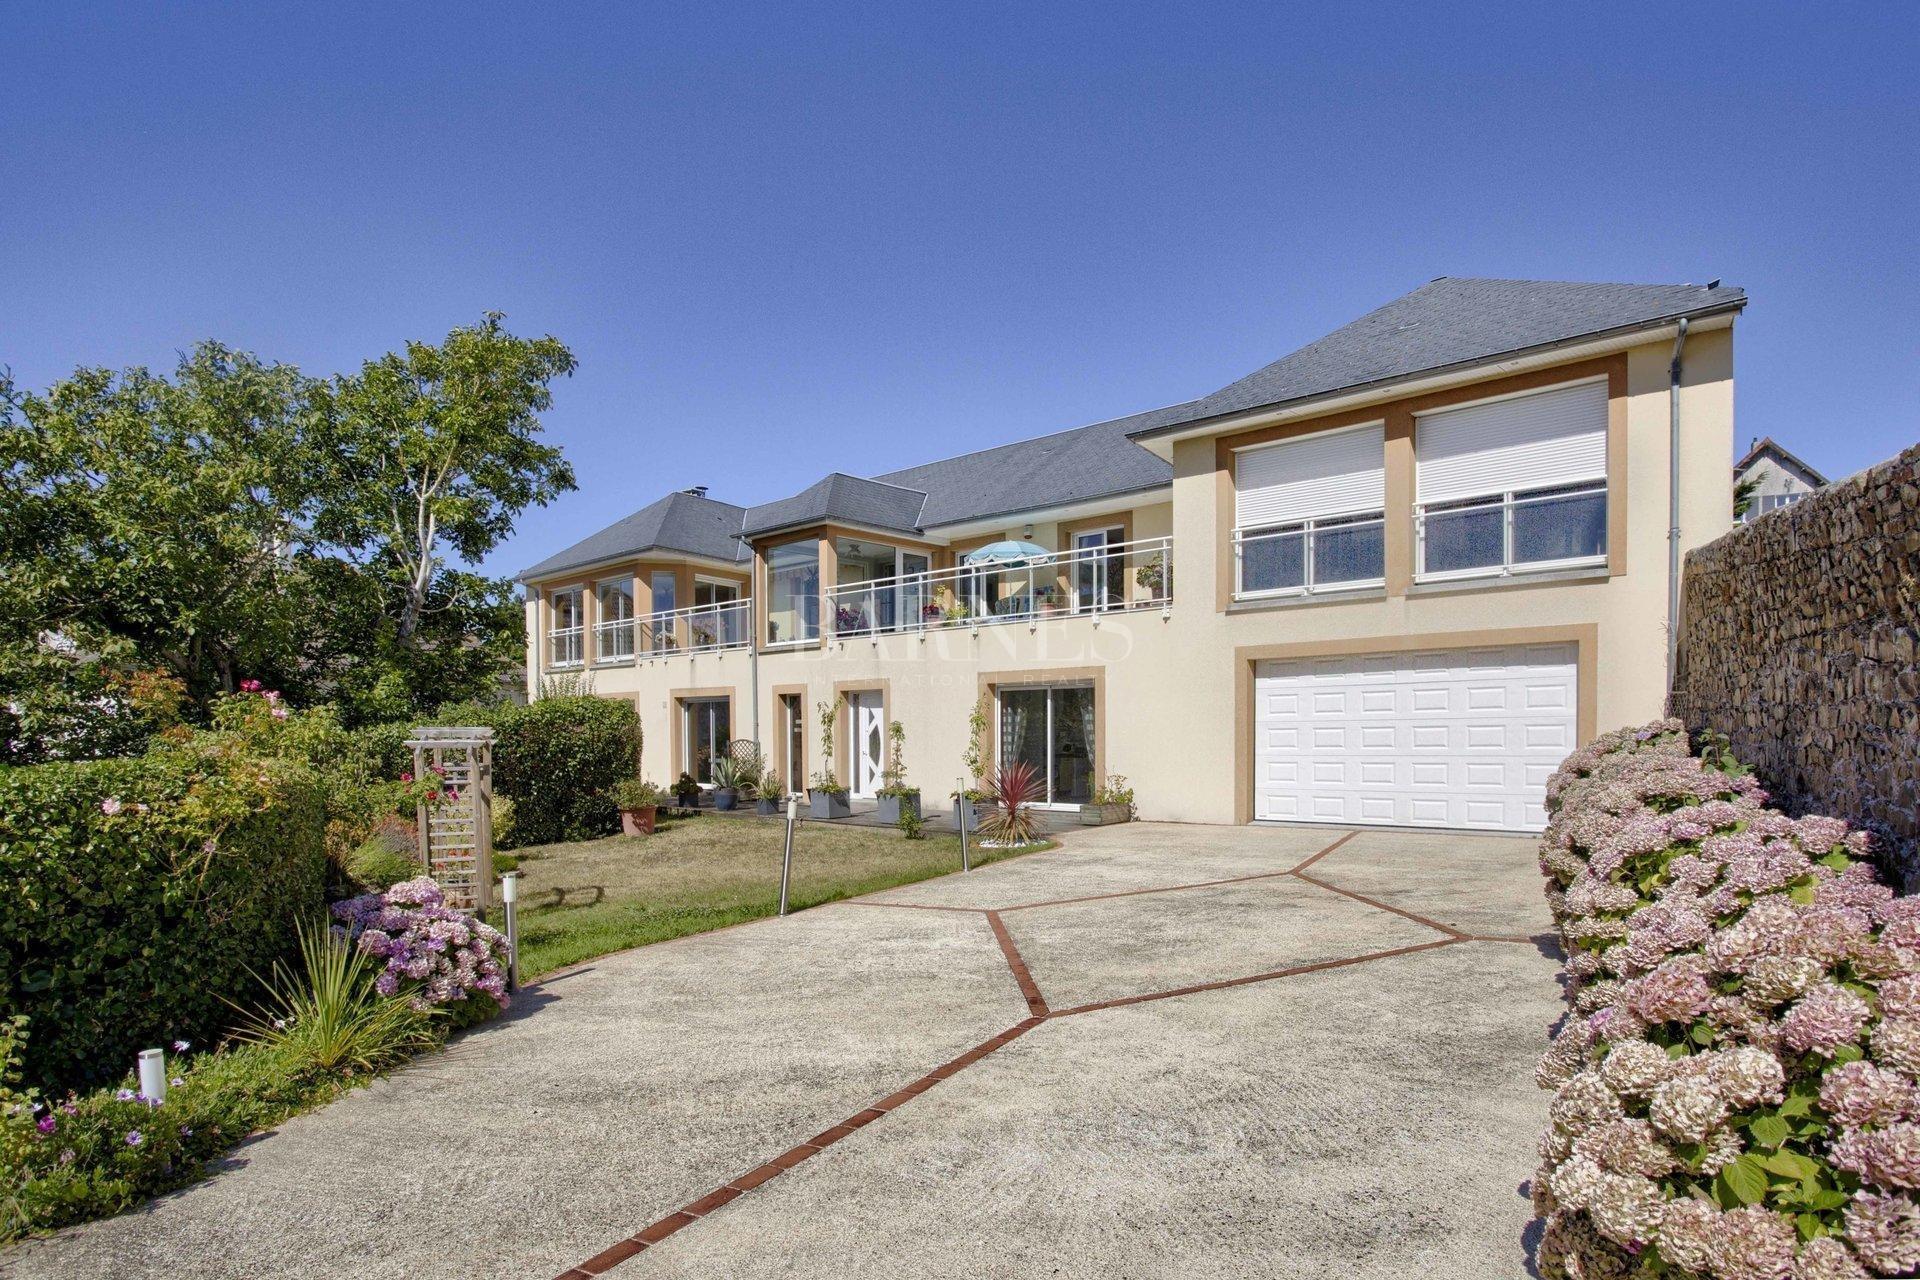 House in Saint-Pair-sur-Mer, Normandy, France 1